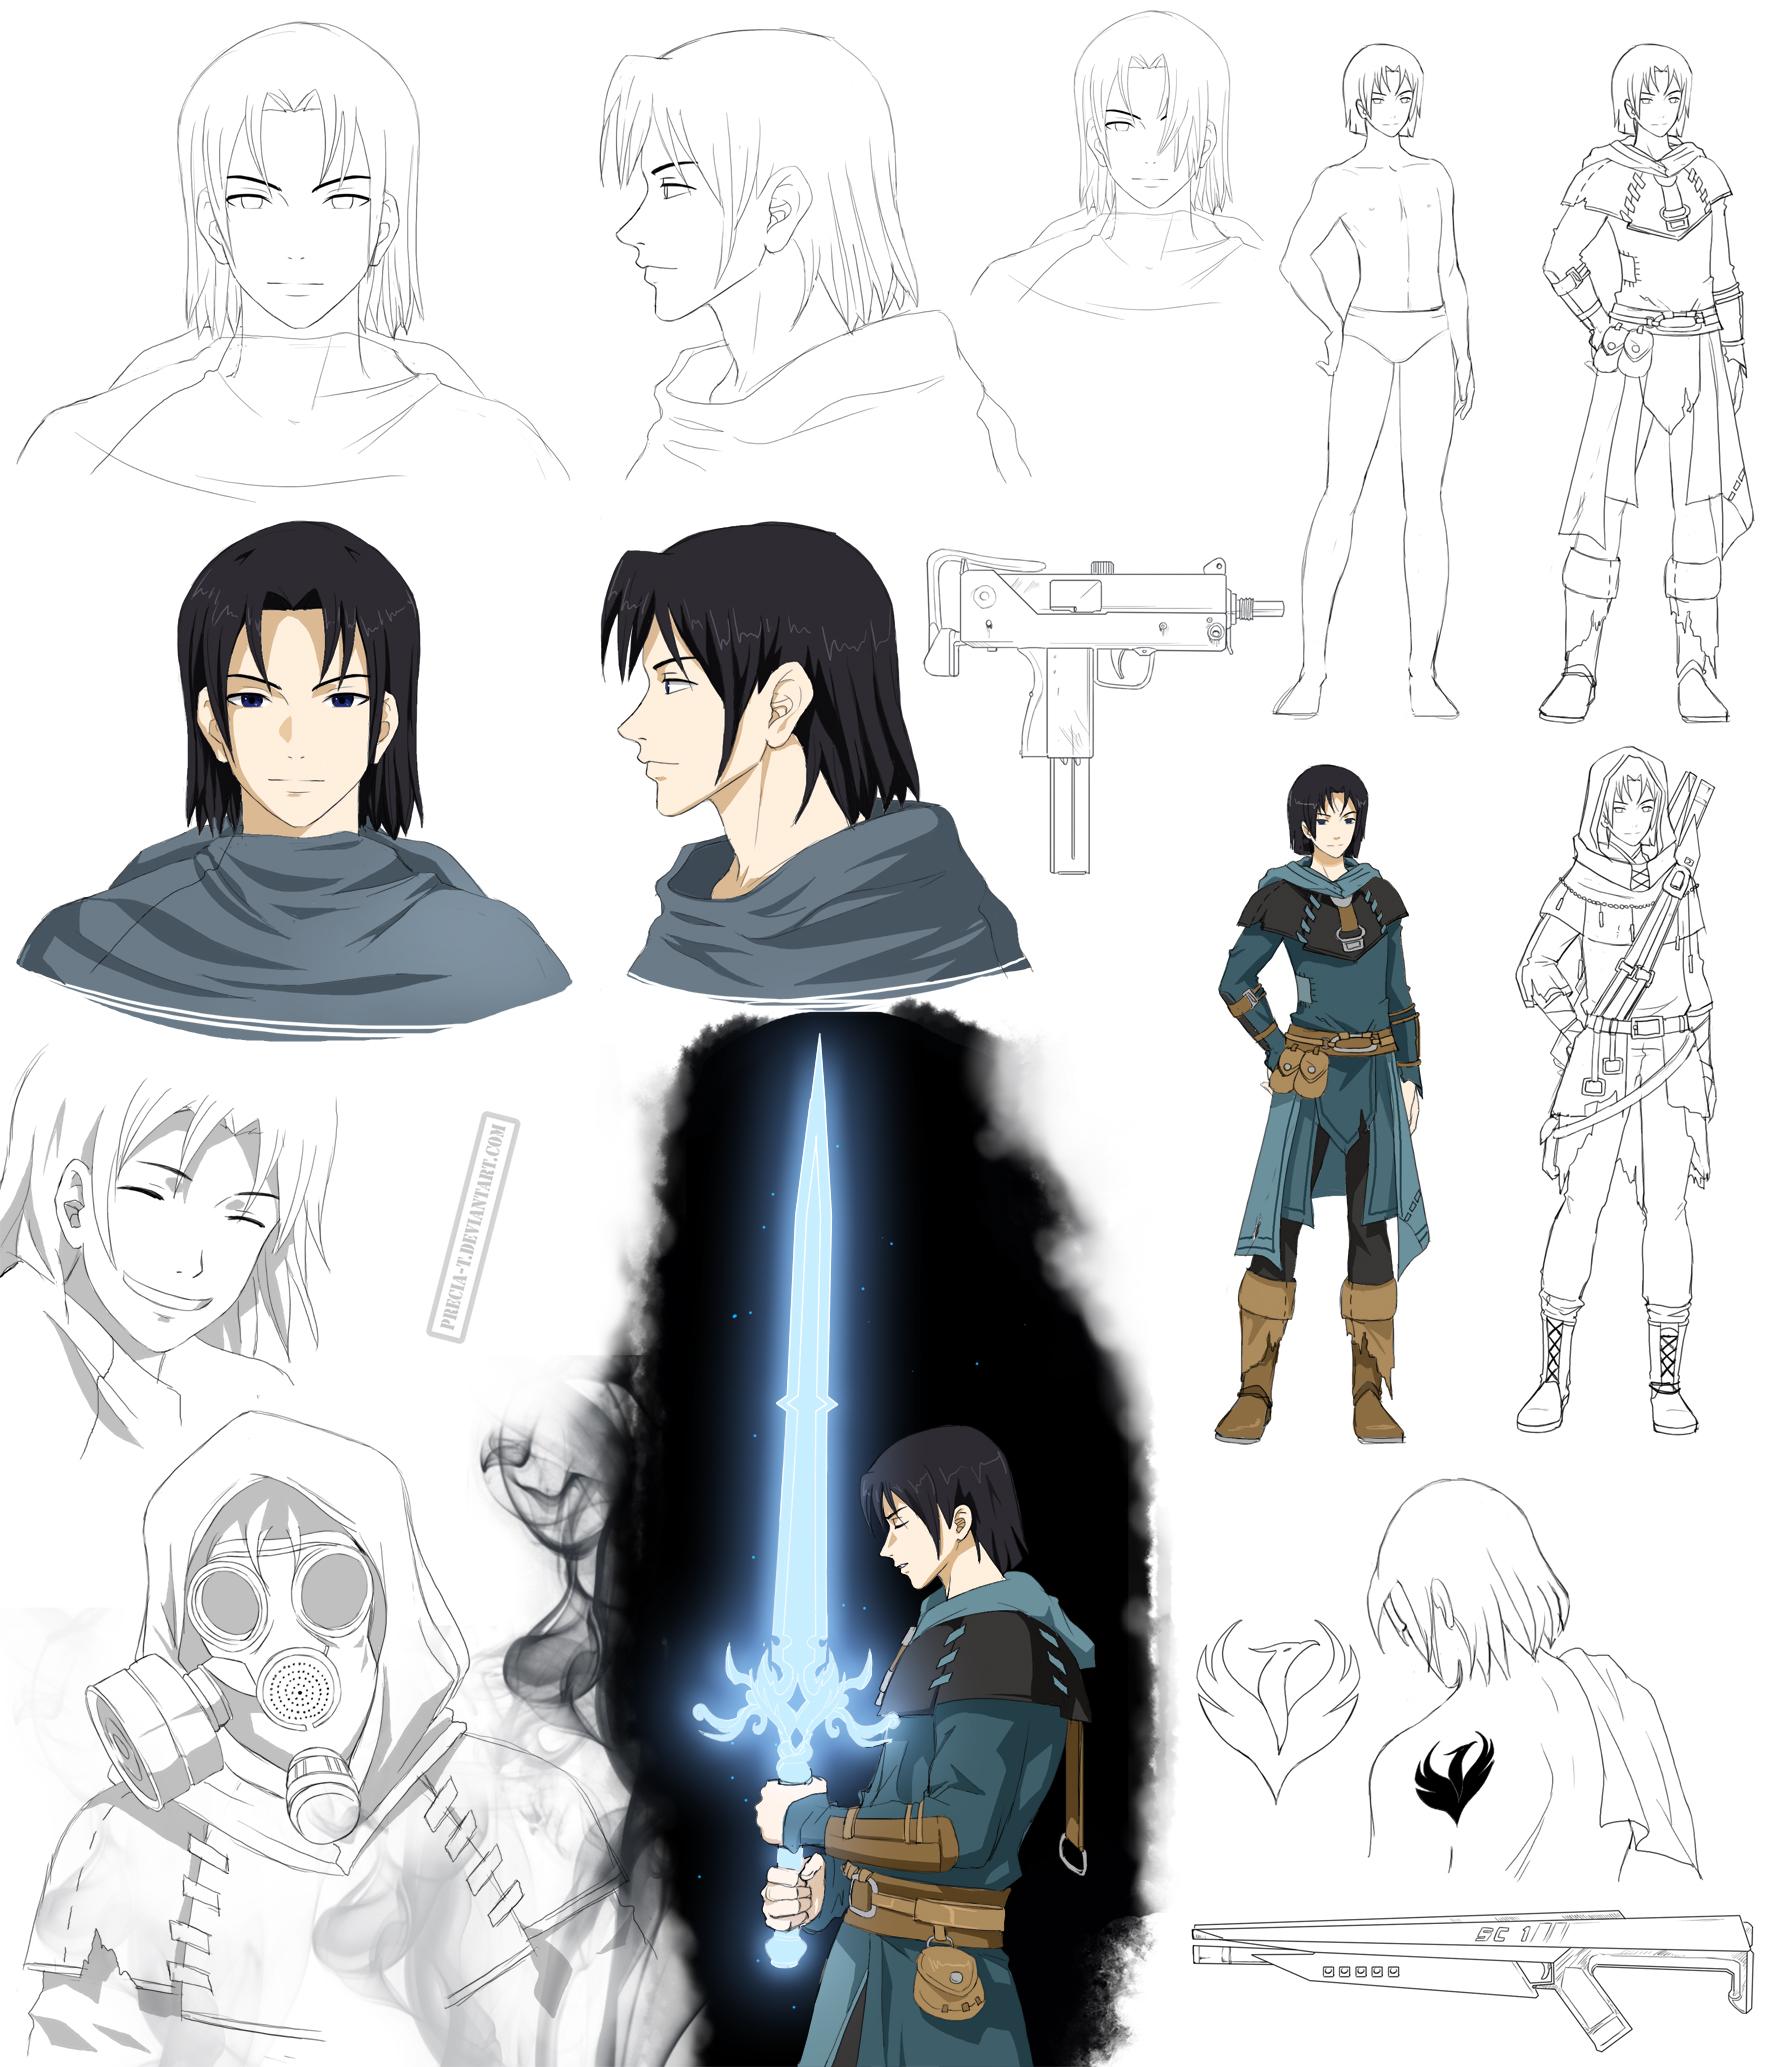 Deviantart Character Design Commission : Futuristic teen guy design max commission by precia t